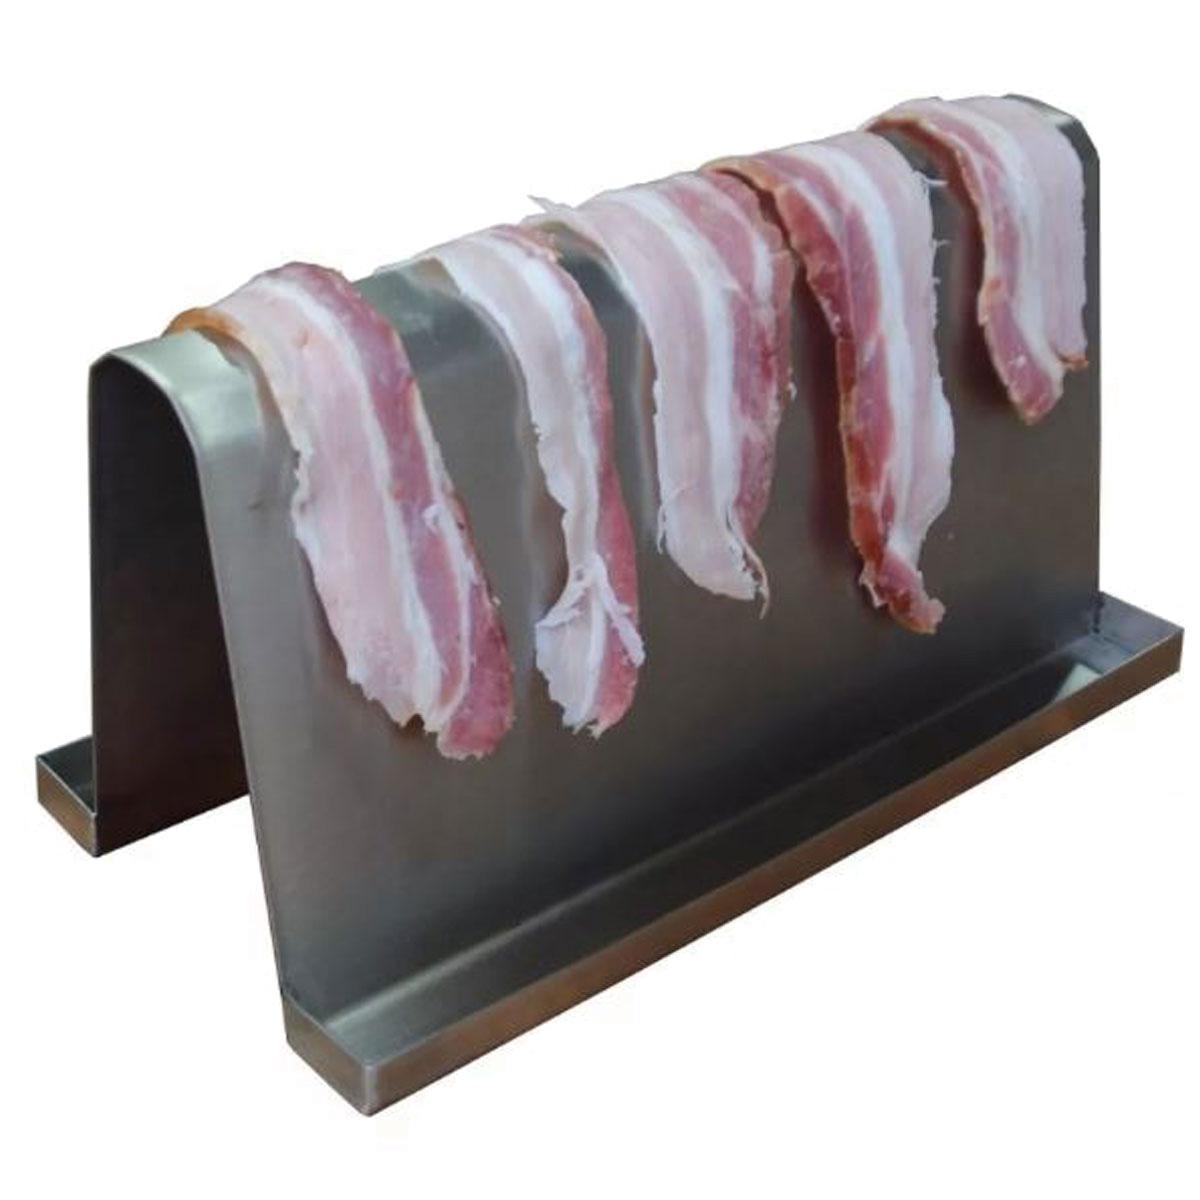 Chapa Bacon Grilling Crispy Inox 304